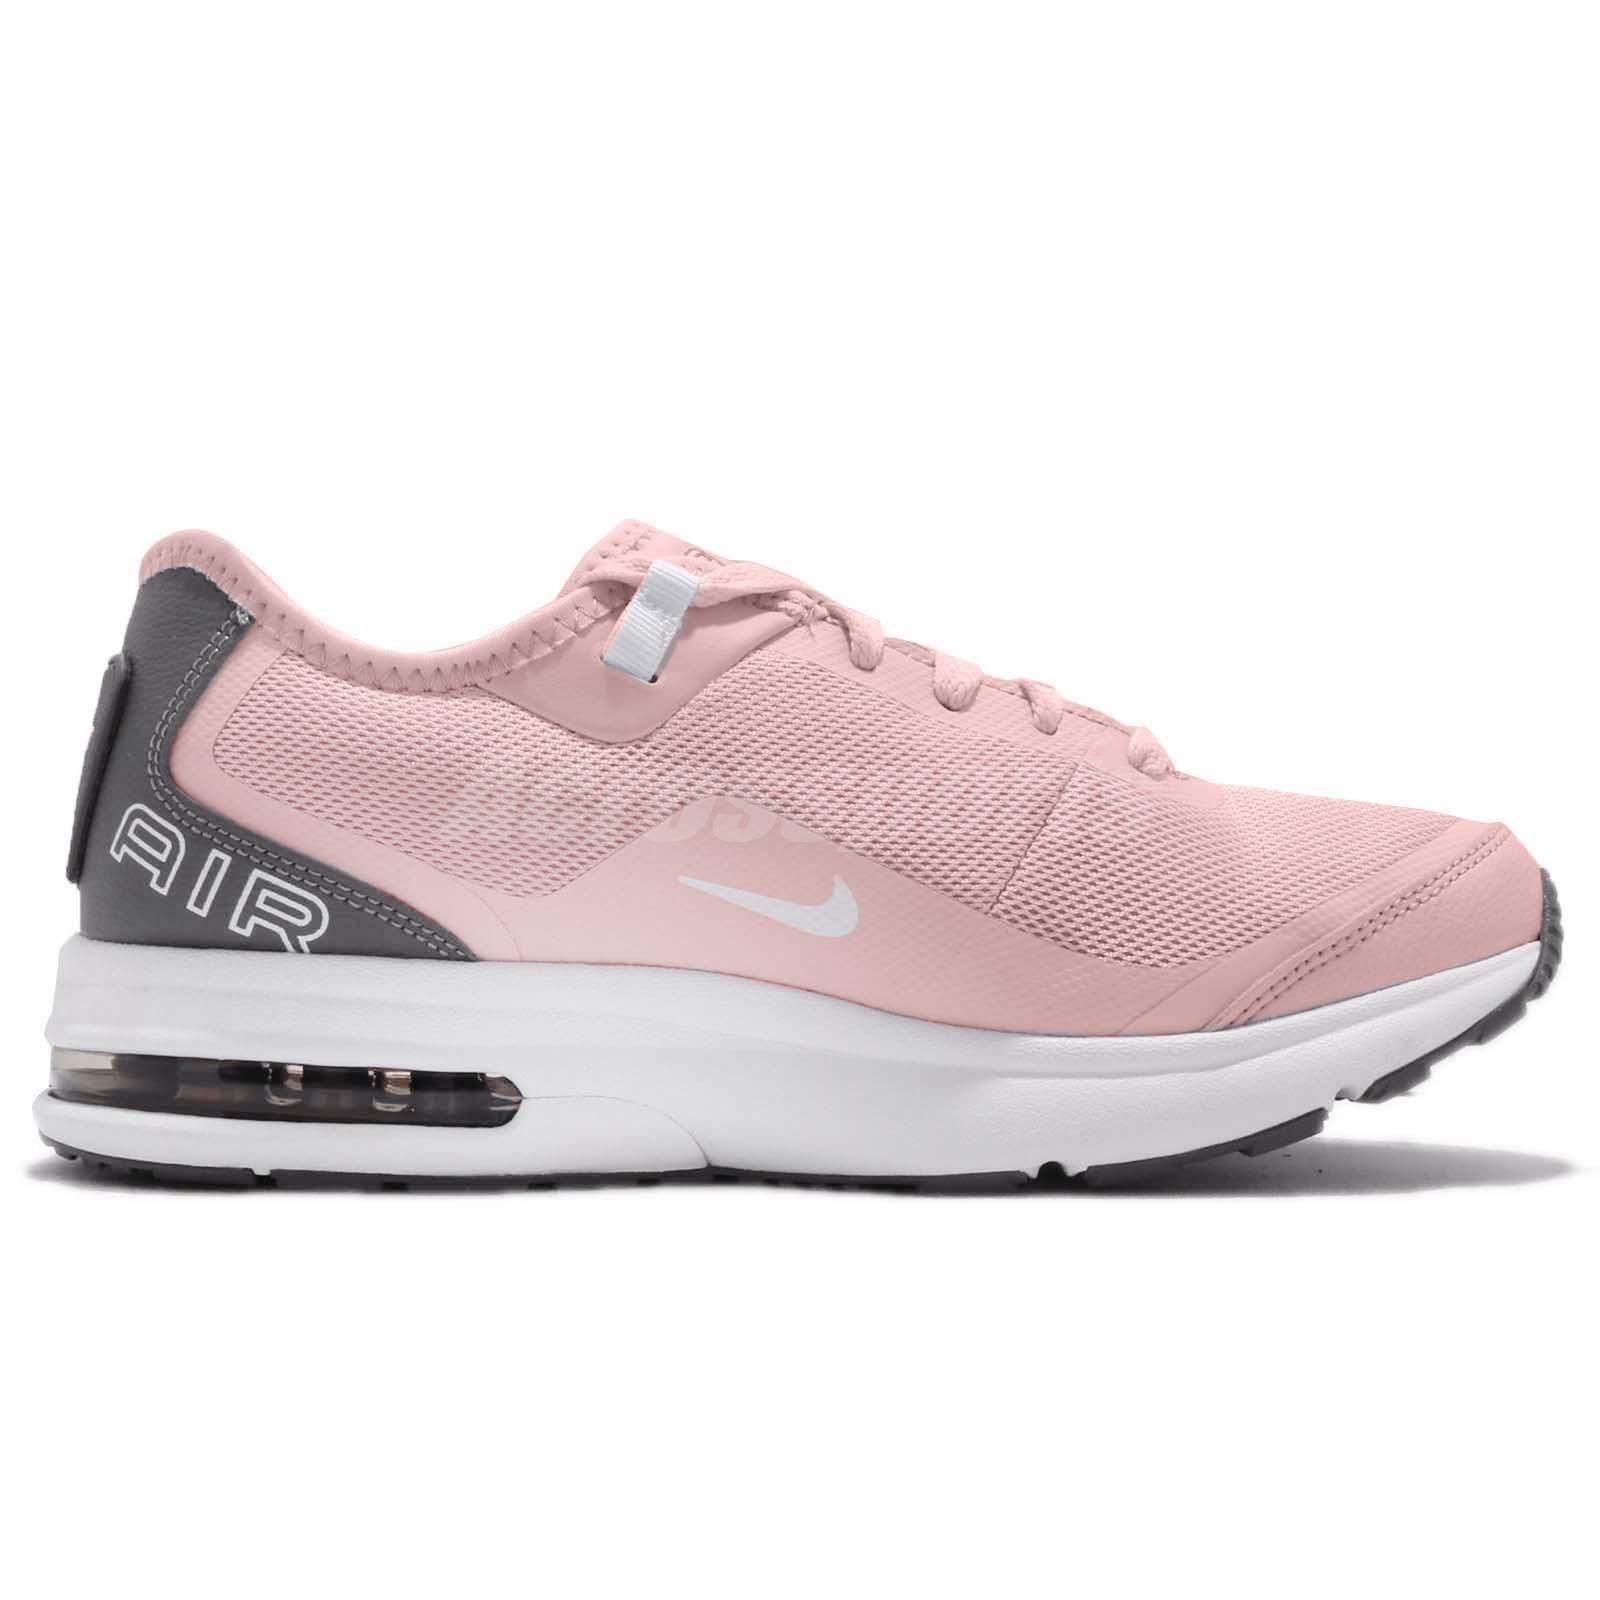 Nike Air Max LB GS Barely Rose Gunsmoke homme Femme  Running Chaussures